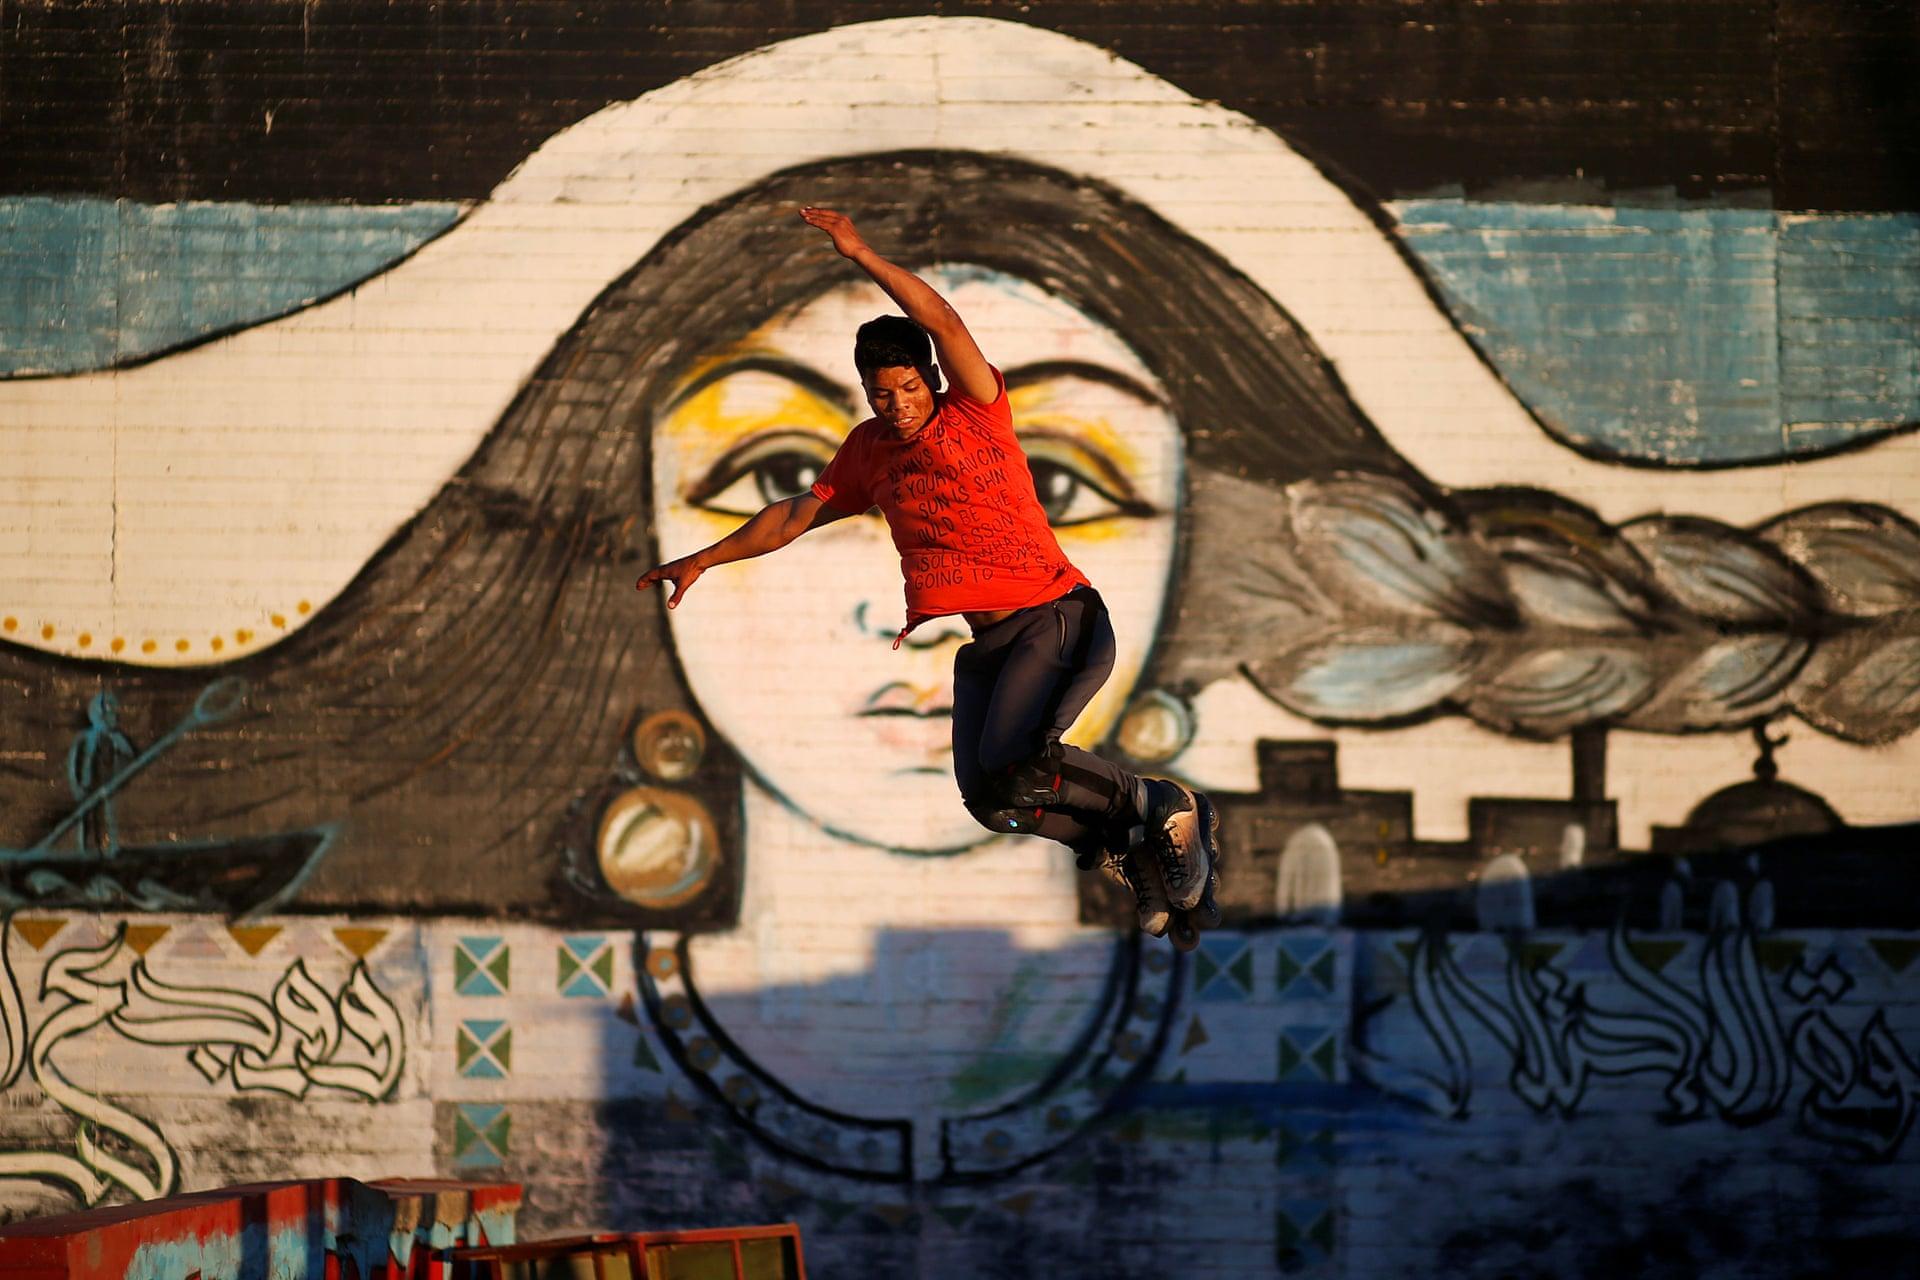 Gaza Youth Skate. Fotografía: Mohammed Salem/Reuters